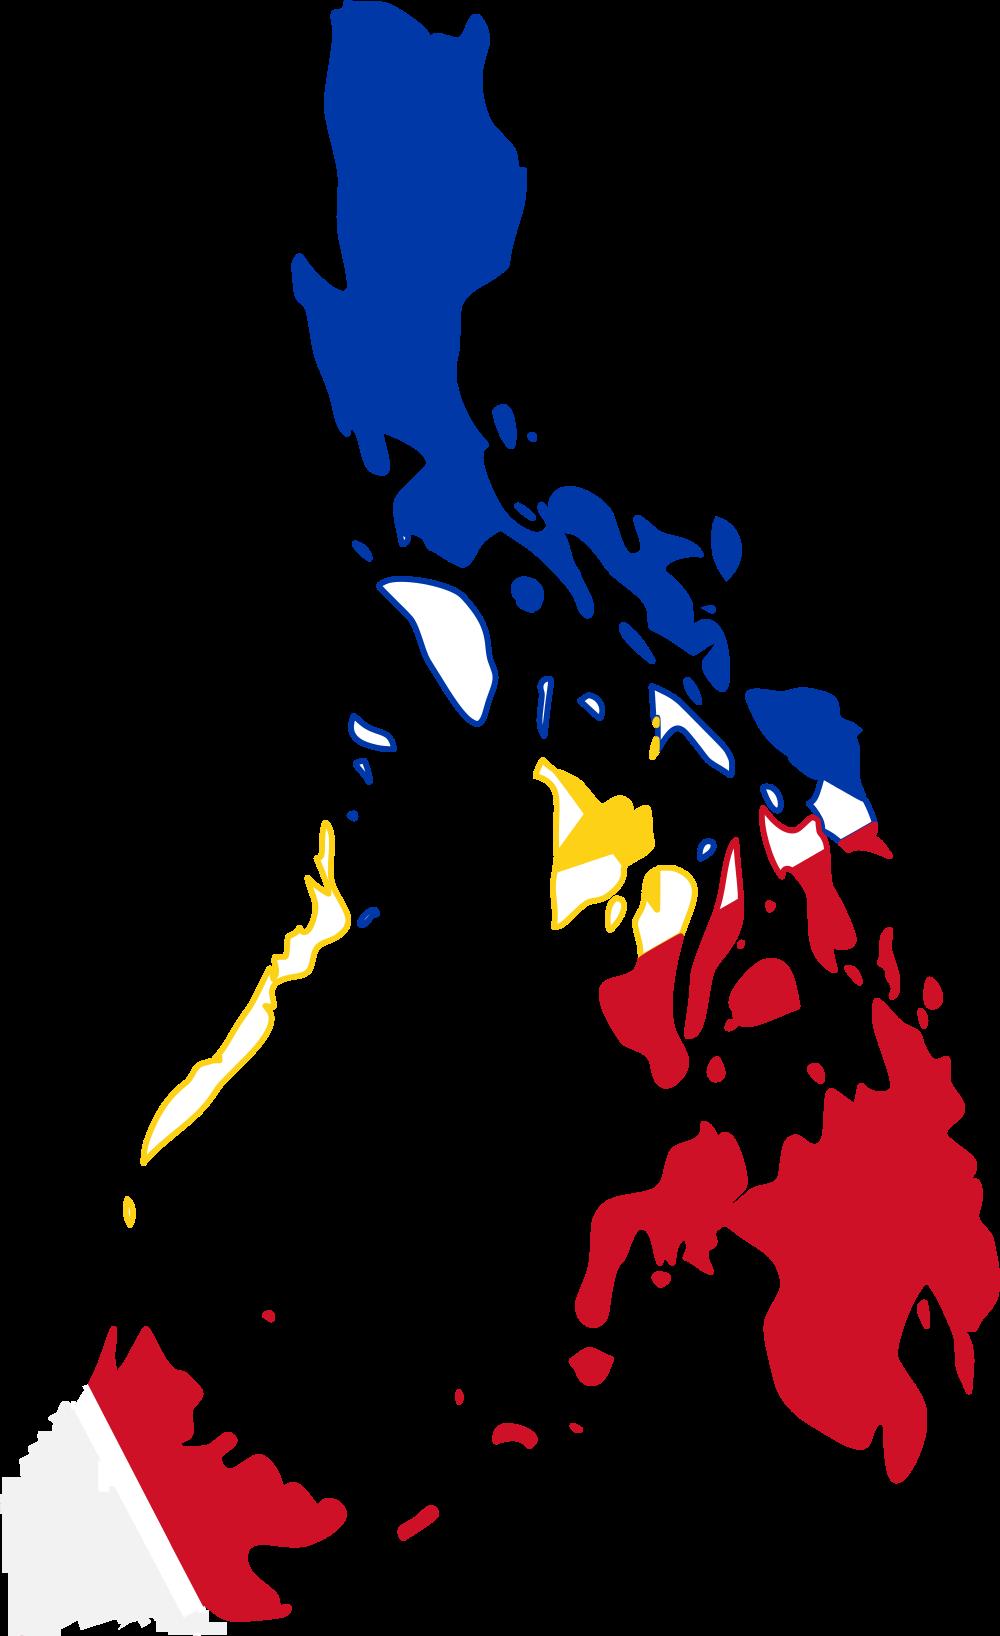 clip art philippine flag - photo #32